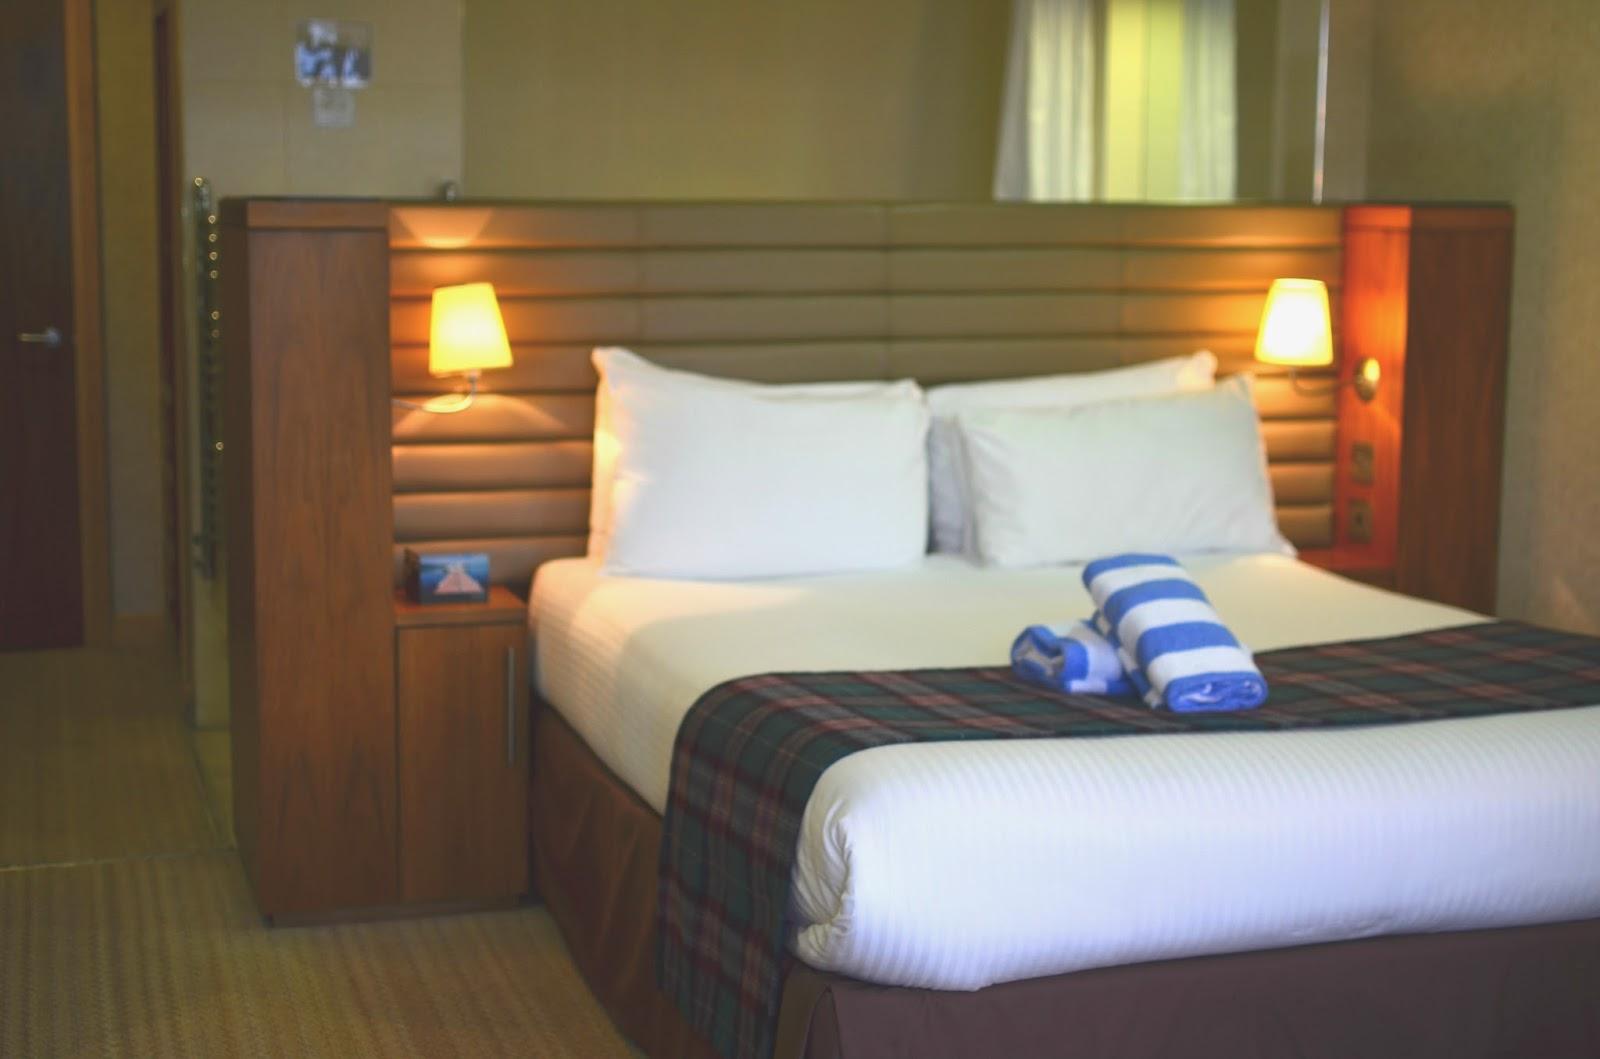 loch lomond, lodge on the loch munros room, scotland, scottish hotel,